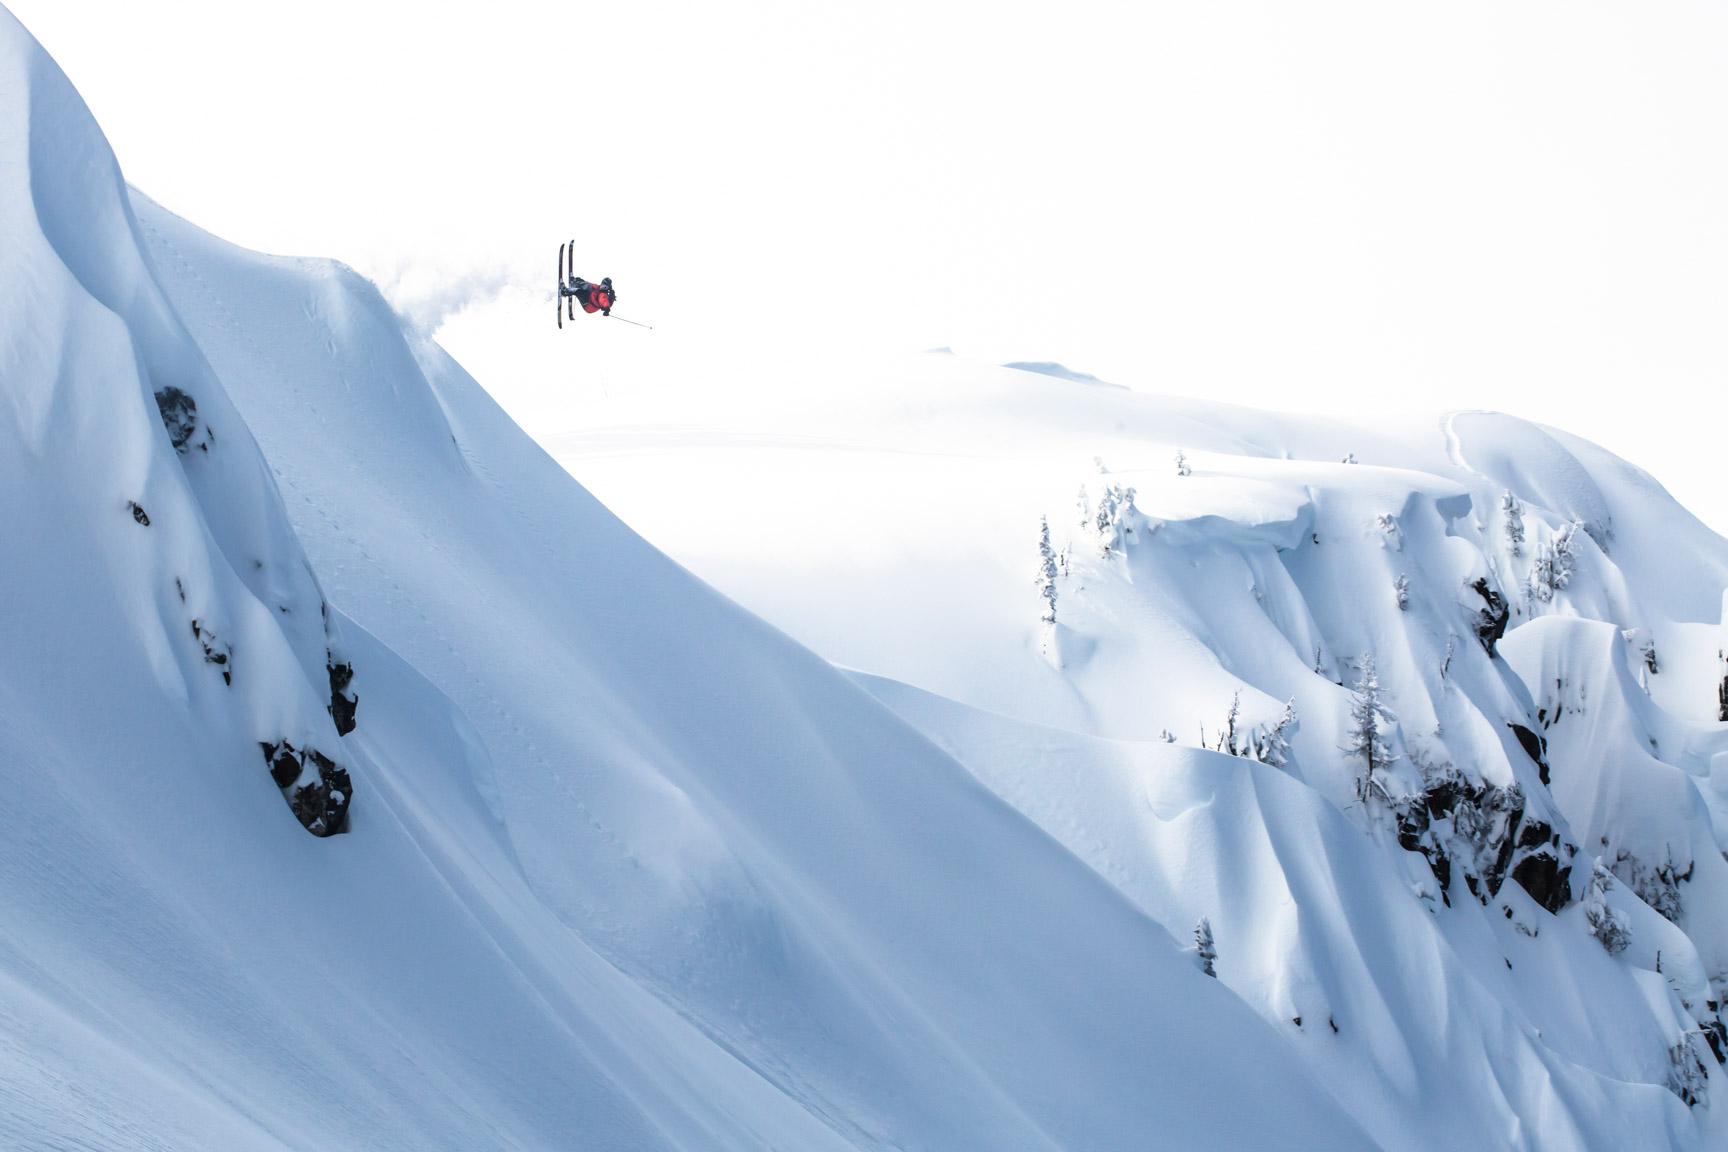 Kye Petersen, Coast Mountains, Canada